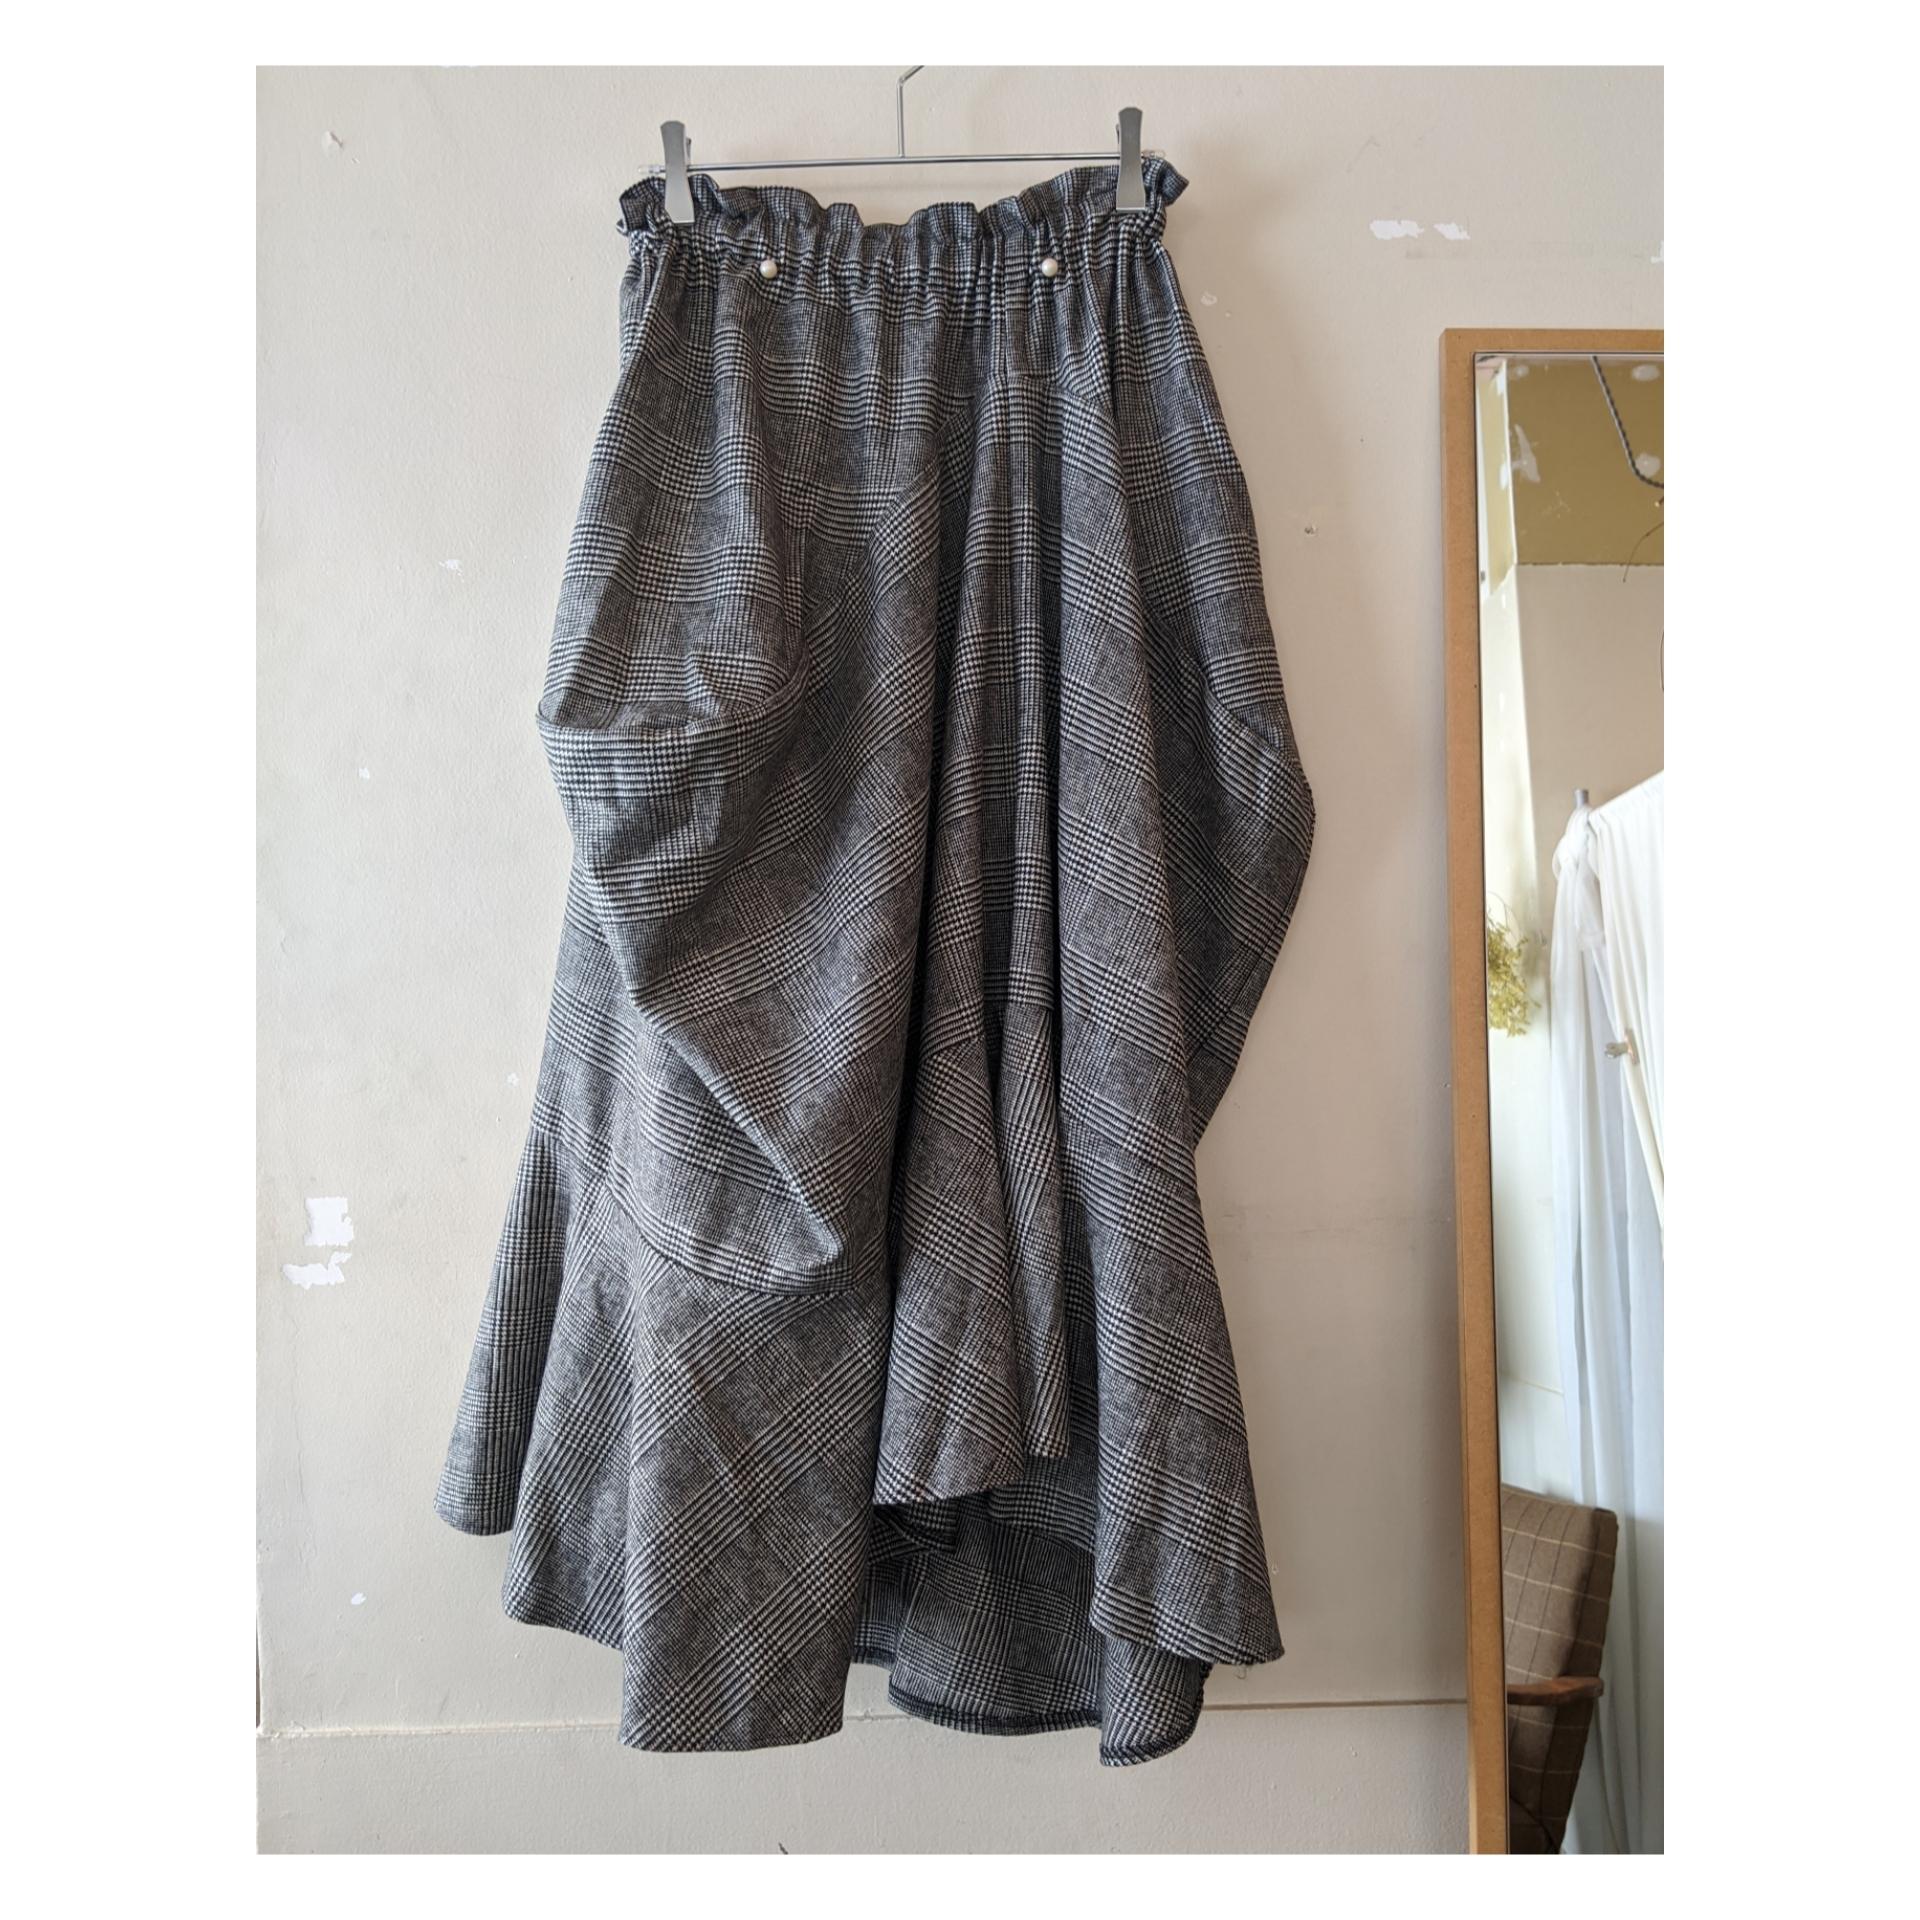 【 HOUGA 】ホウガ twiddle skirt / クラシックチェック / チェック柄 / ドレープロングスカート